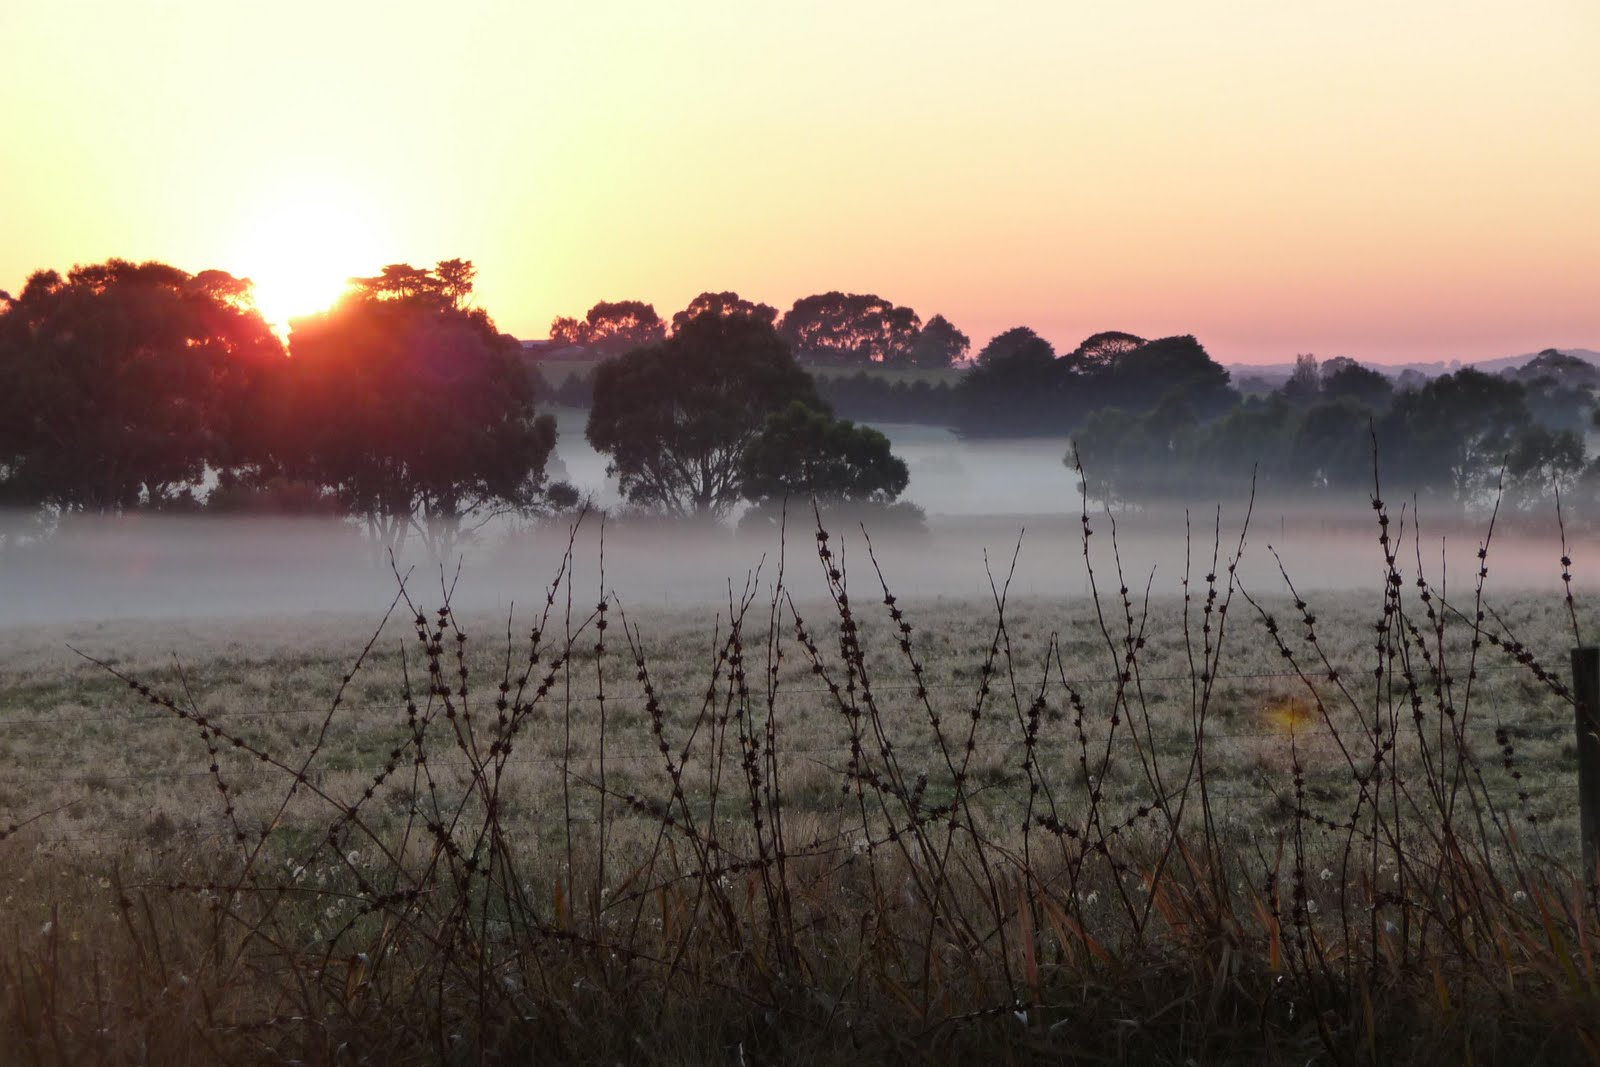 sunrise on a farm - Google Search | Cityscape | Pinterest